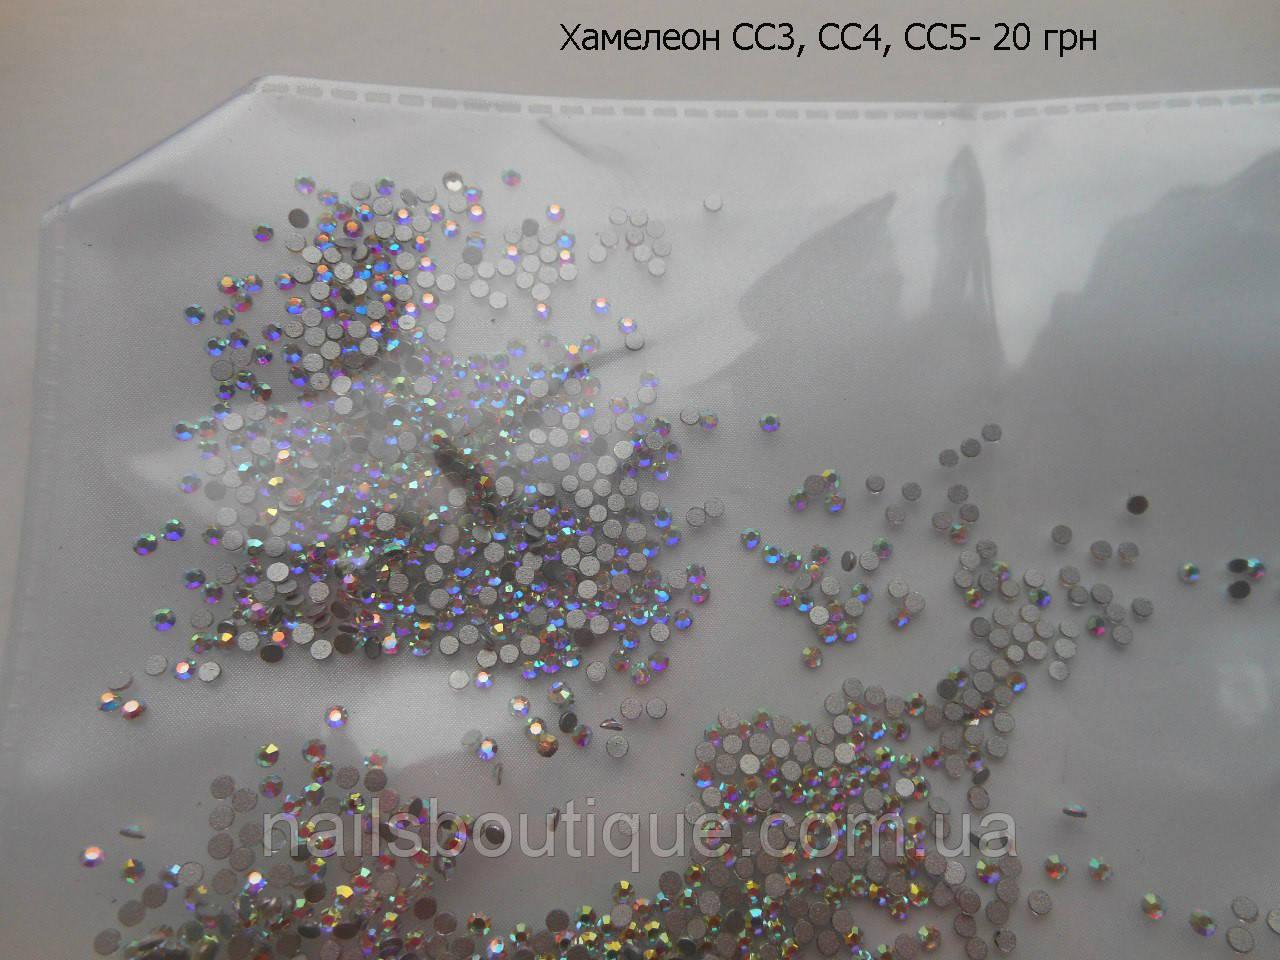 Стразы хамелеон, стекло, размер СС3 (1,2мм), 1440шт